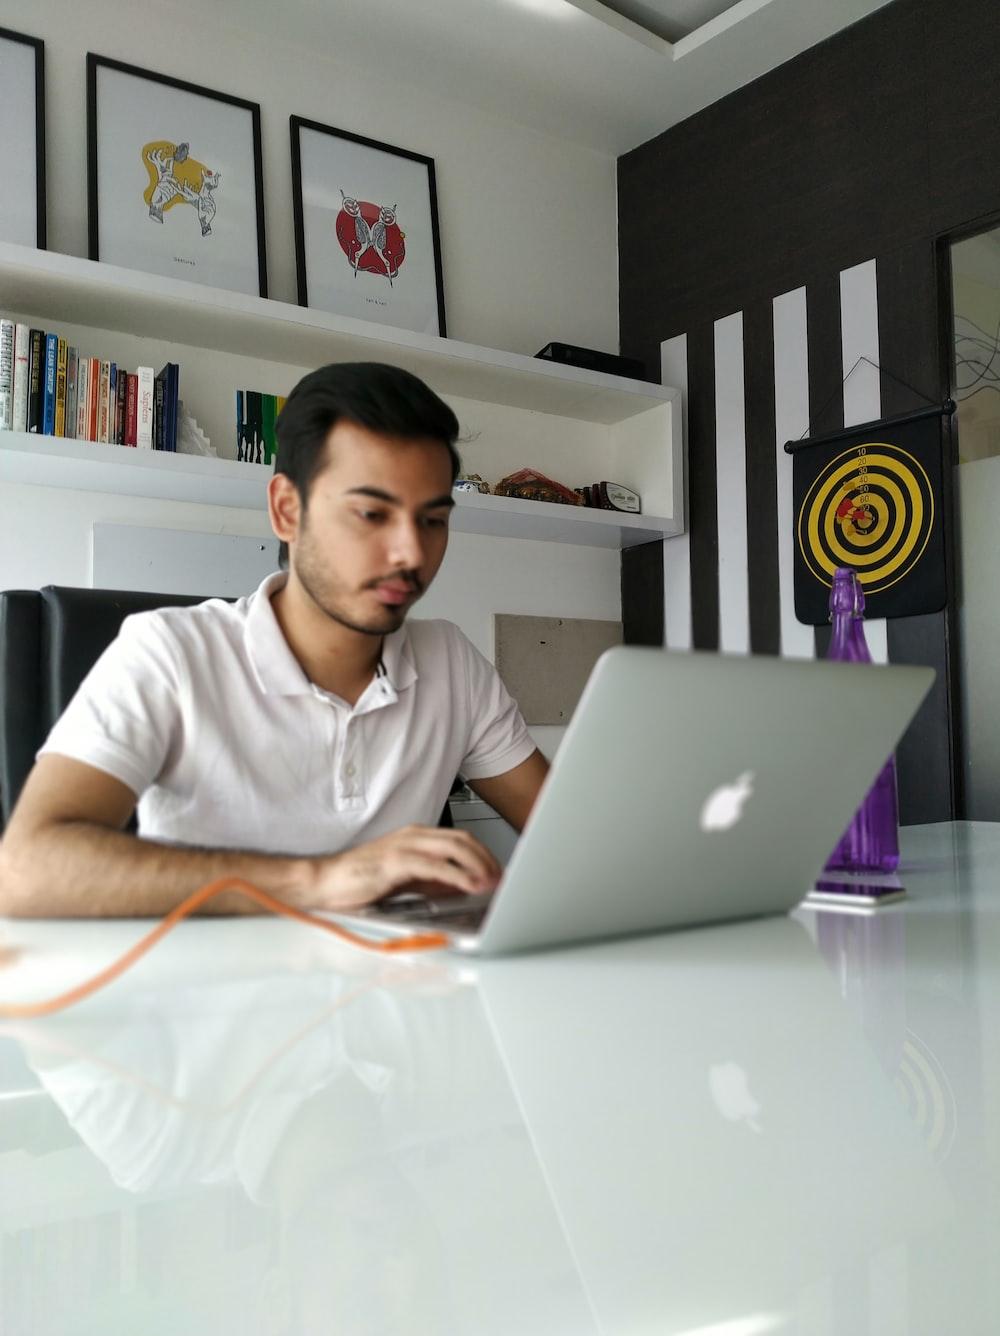 man using MacBook on table